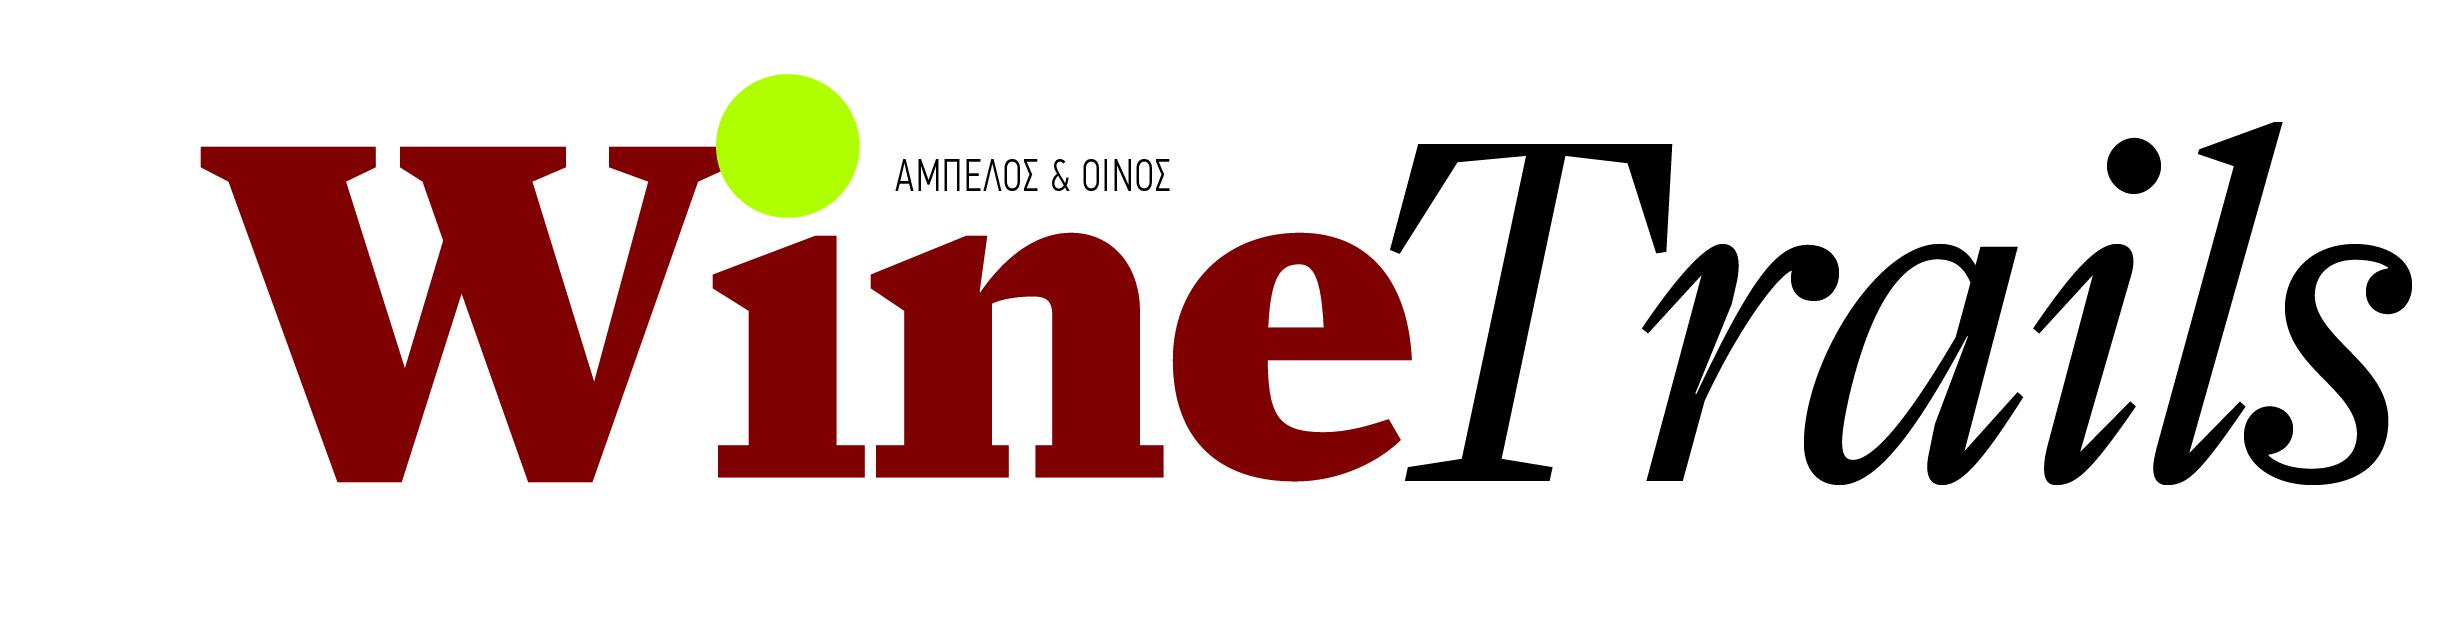 winetrails_logo.jpg